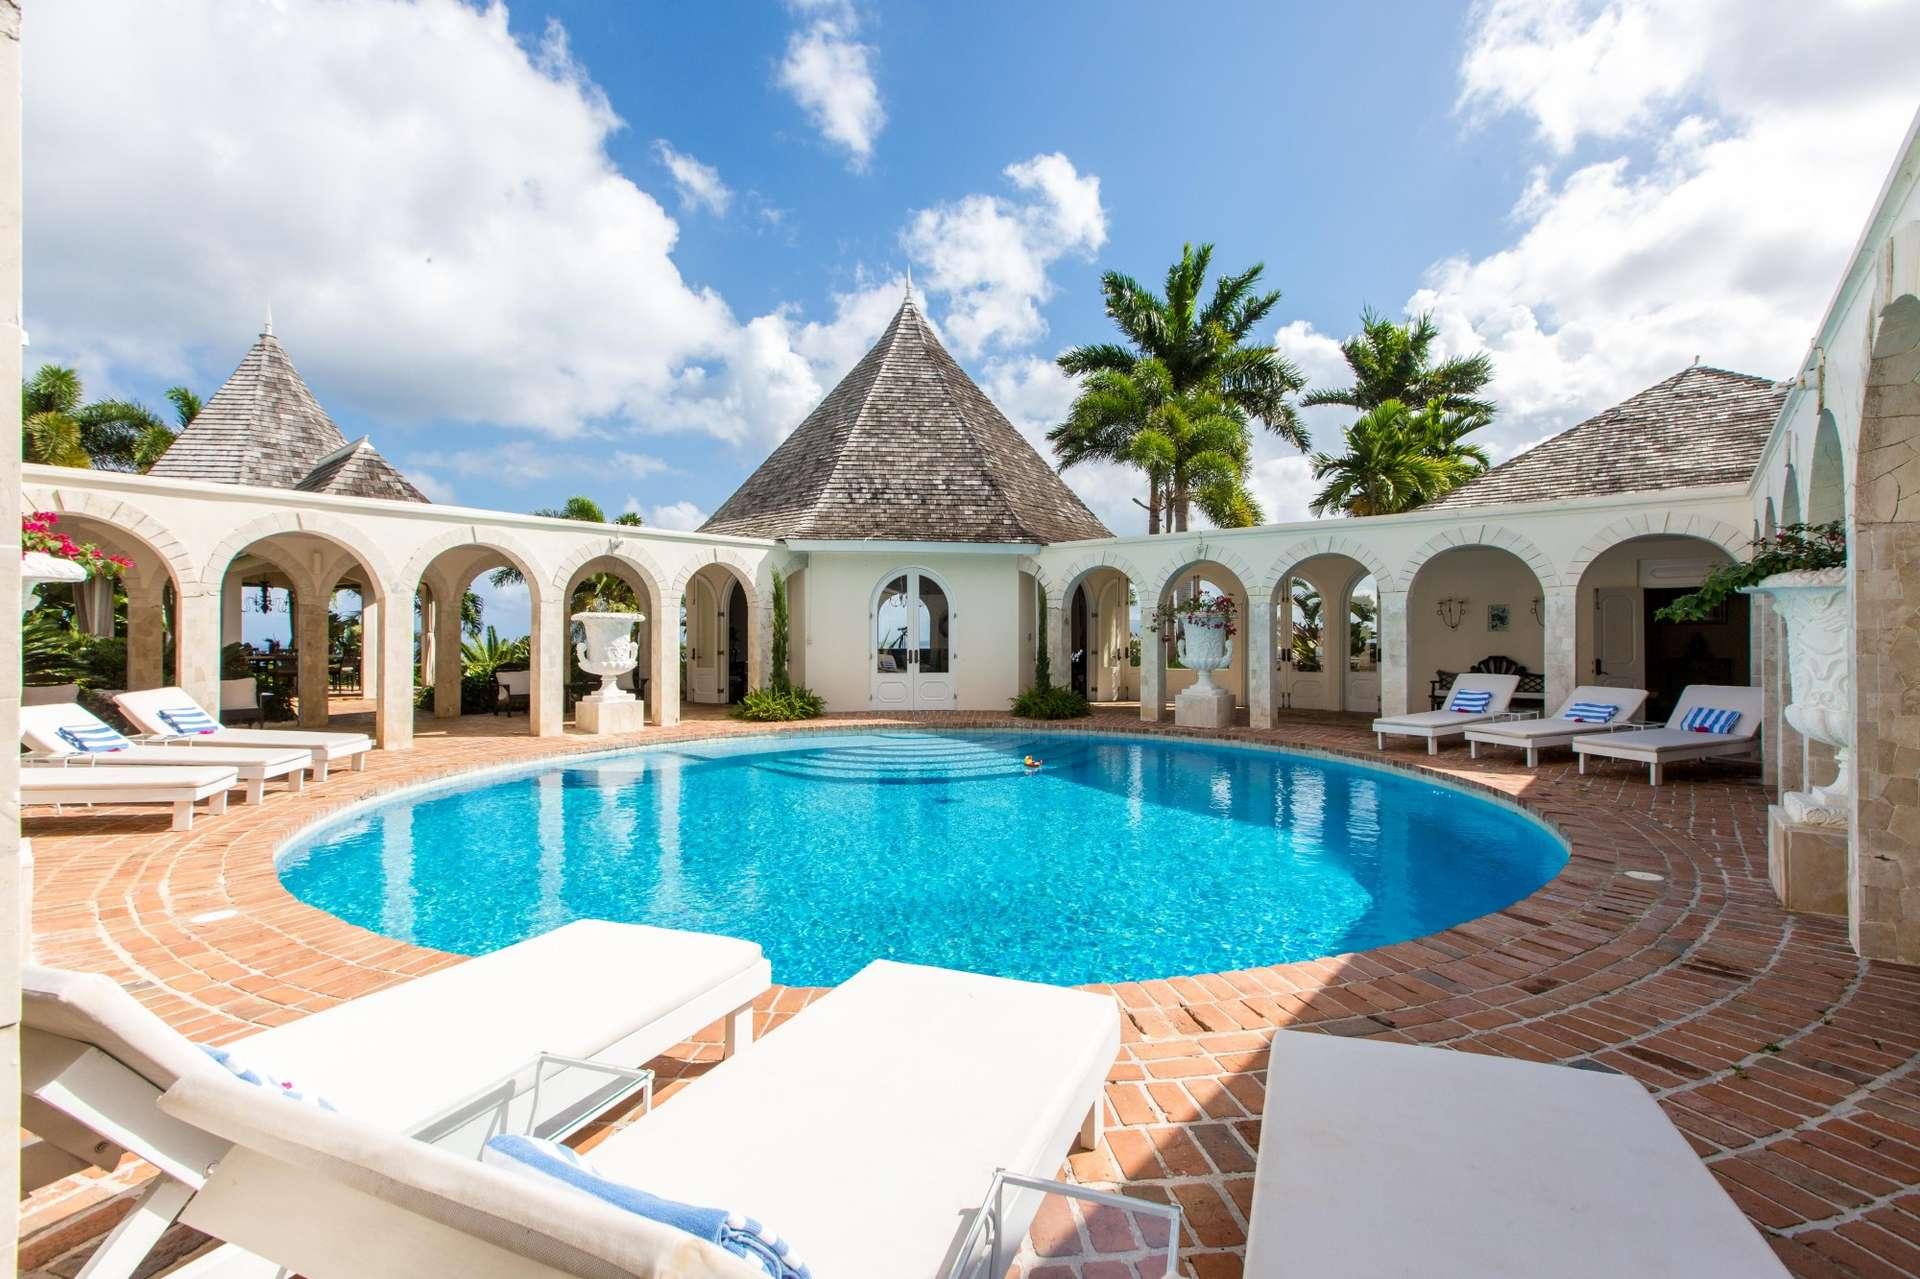 Luxury villa rentals caribbean - Jamaica - Montego bay - Bambu - Image 1/19